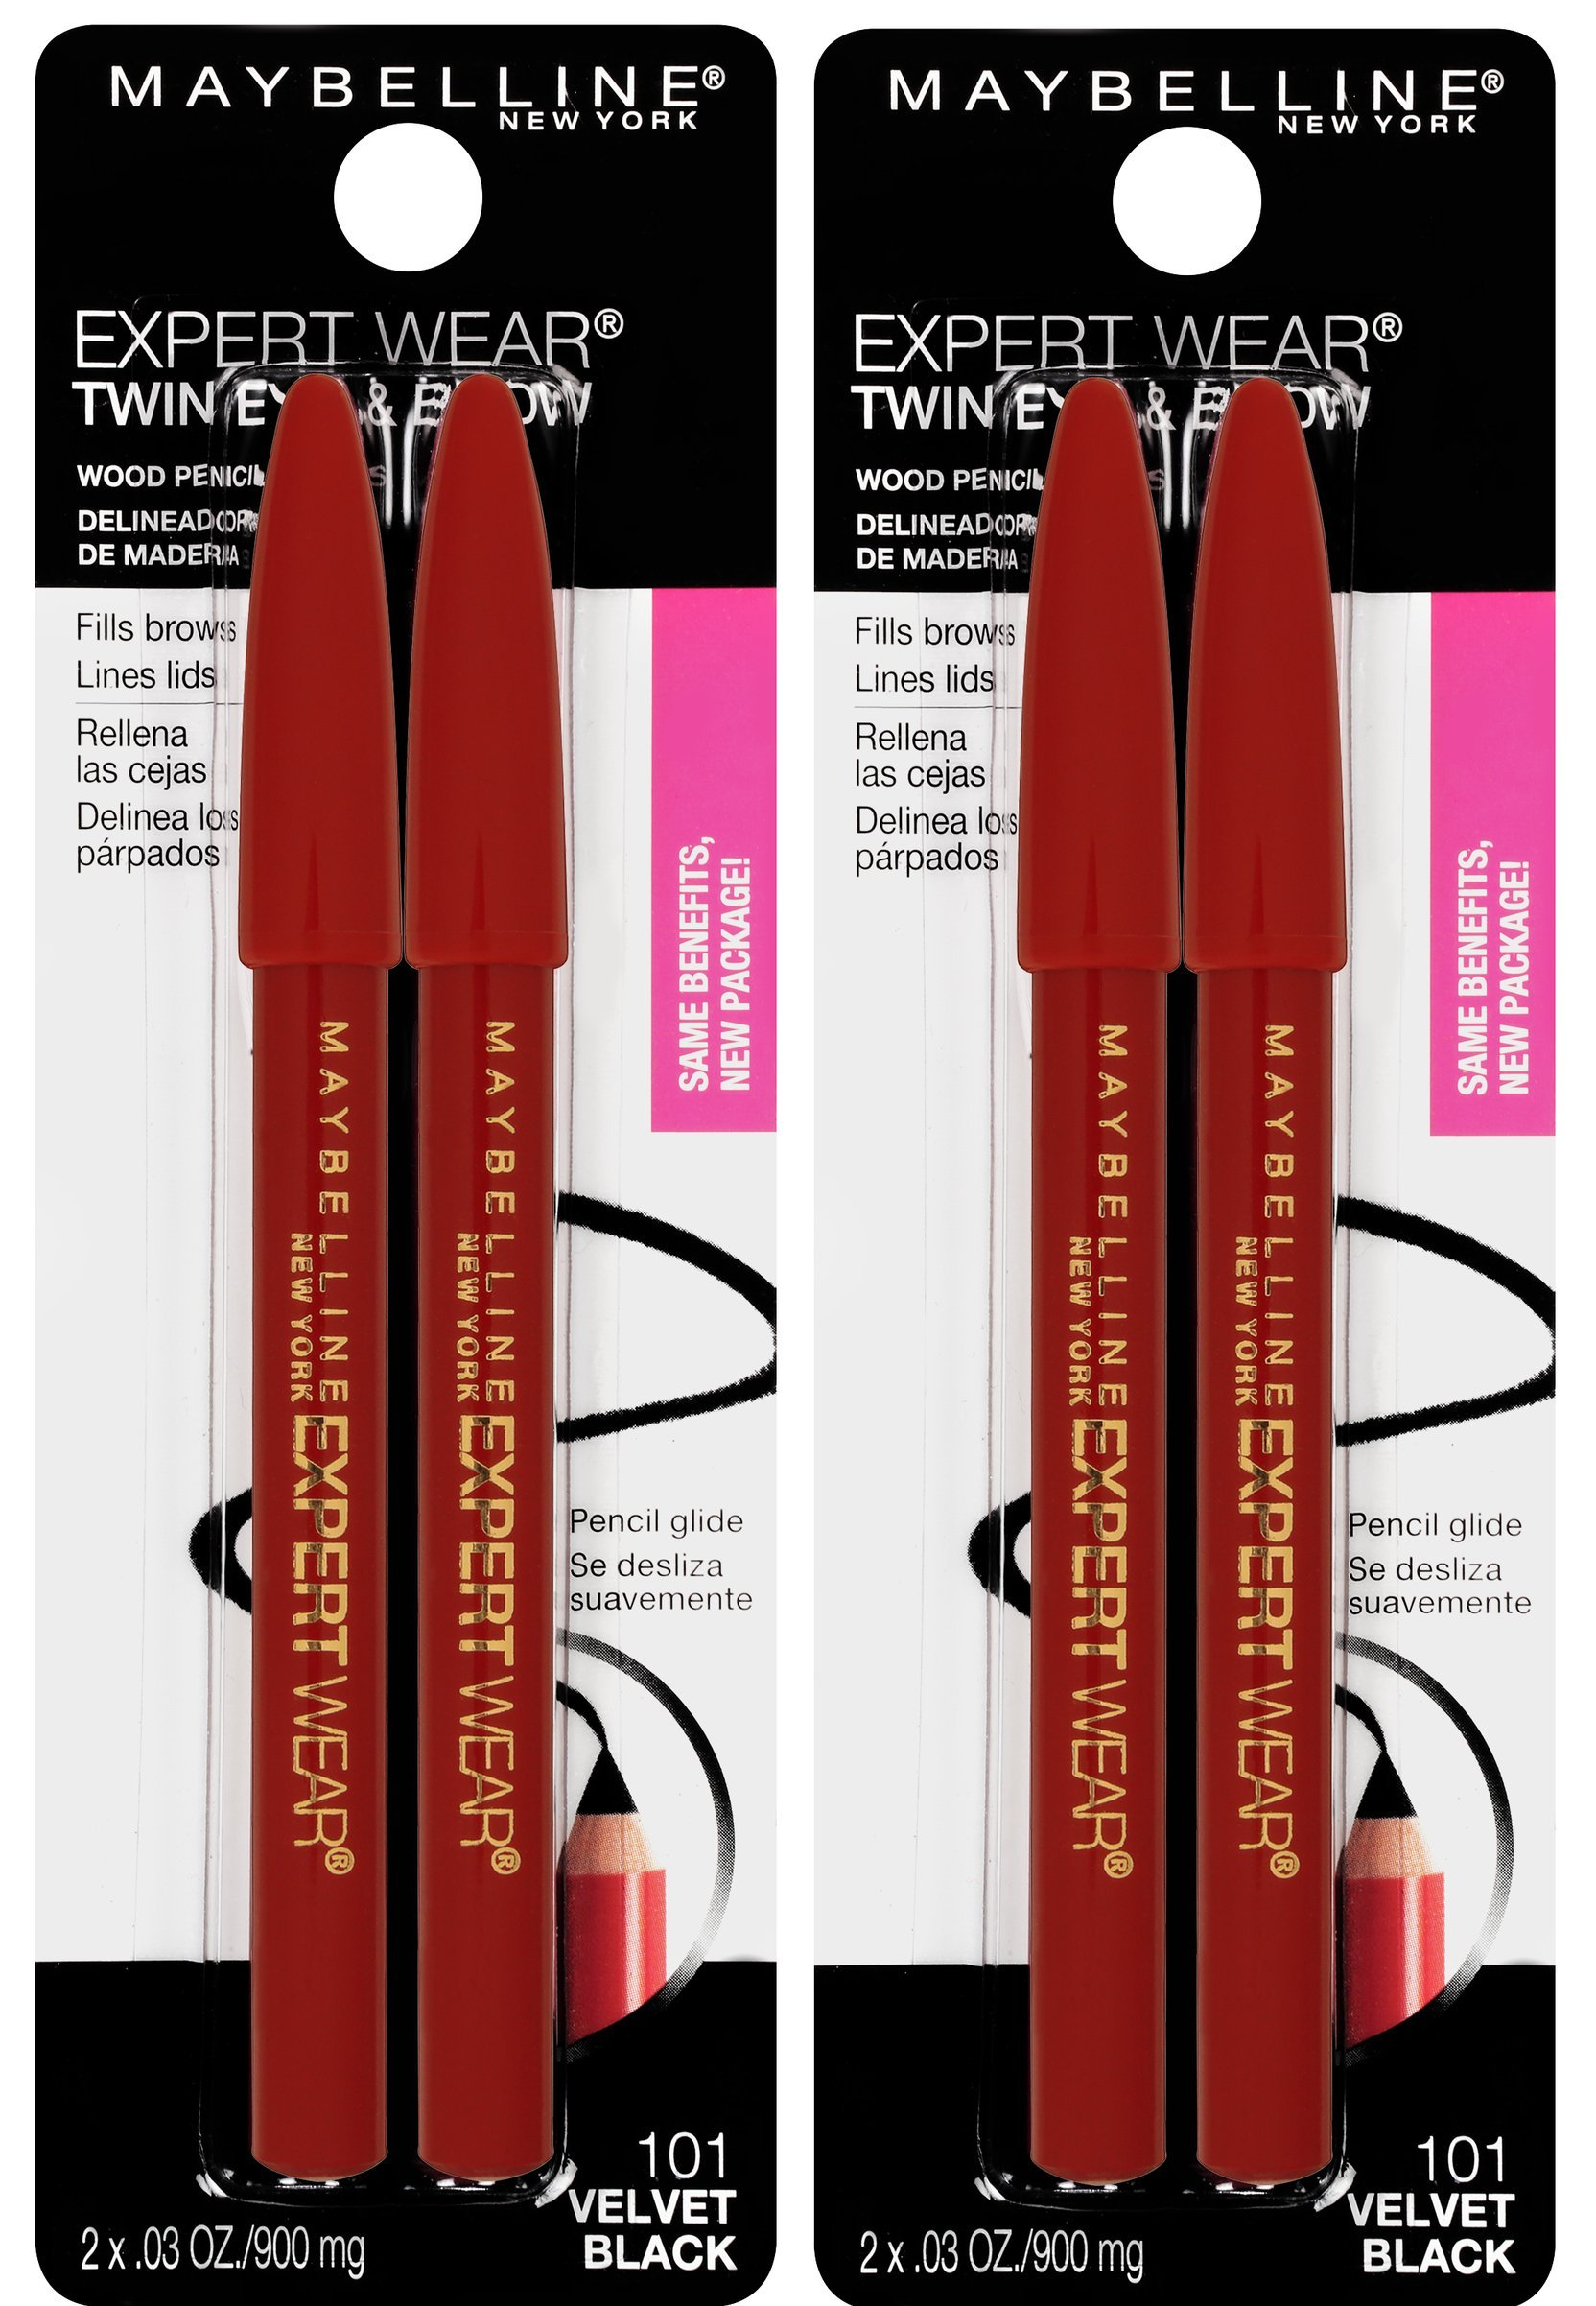 Maybelline New York Expert Wear Twin Brow & Eye Pencils Makeup, Velvet Black, 2 Count Twin (total 4 pencils ), 2 Count (Pack of 2)